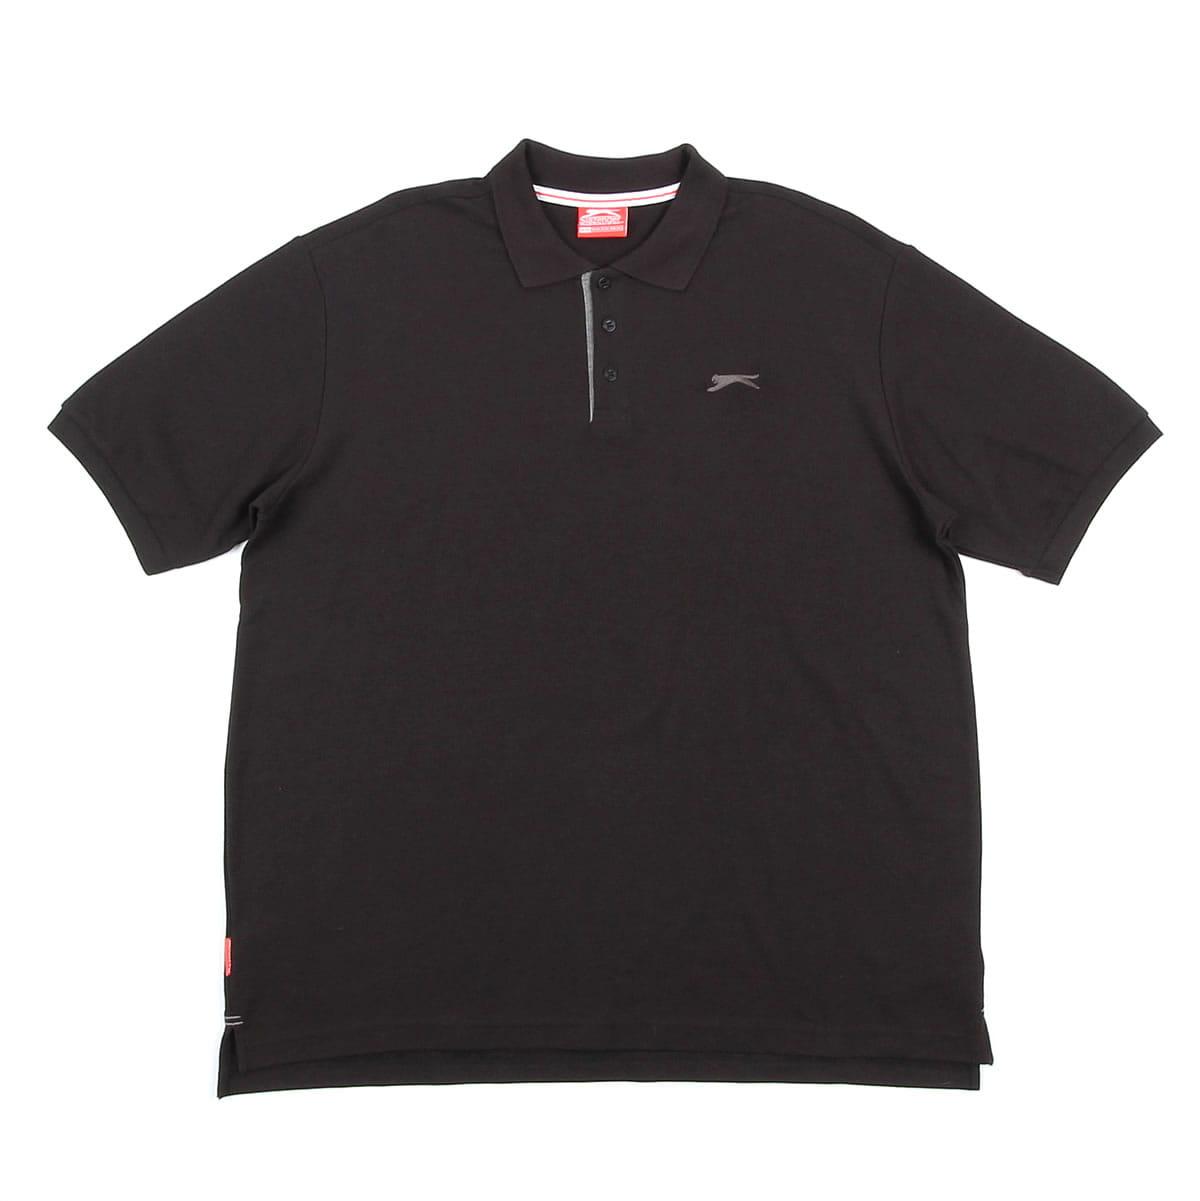 Koszulka polo męska Slazenger XXL